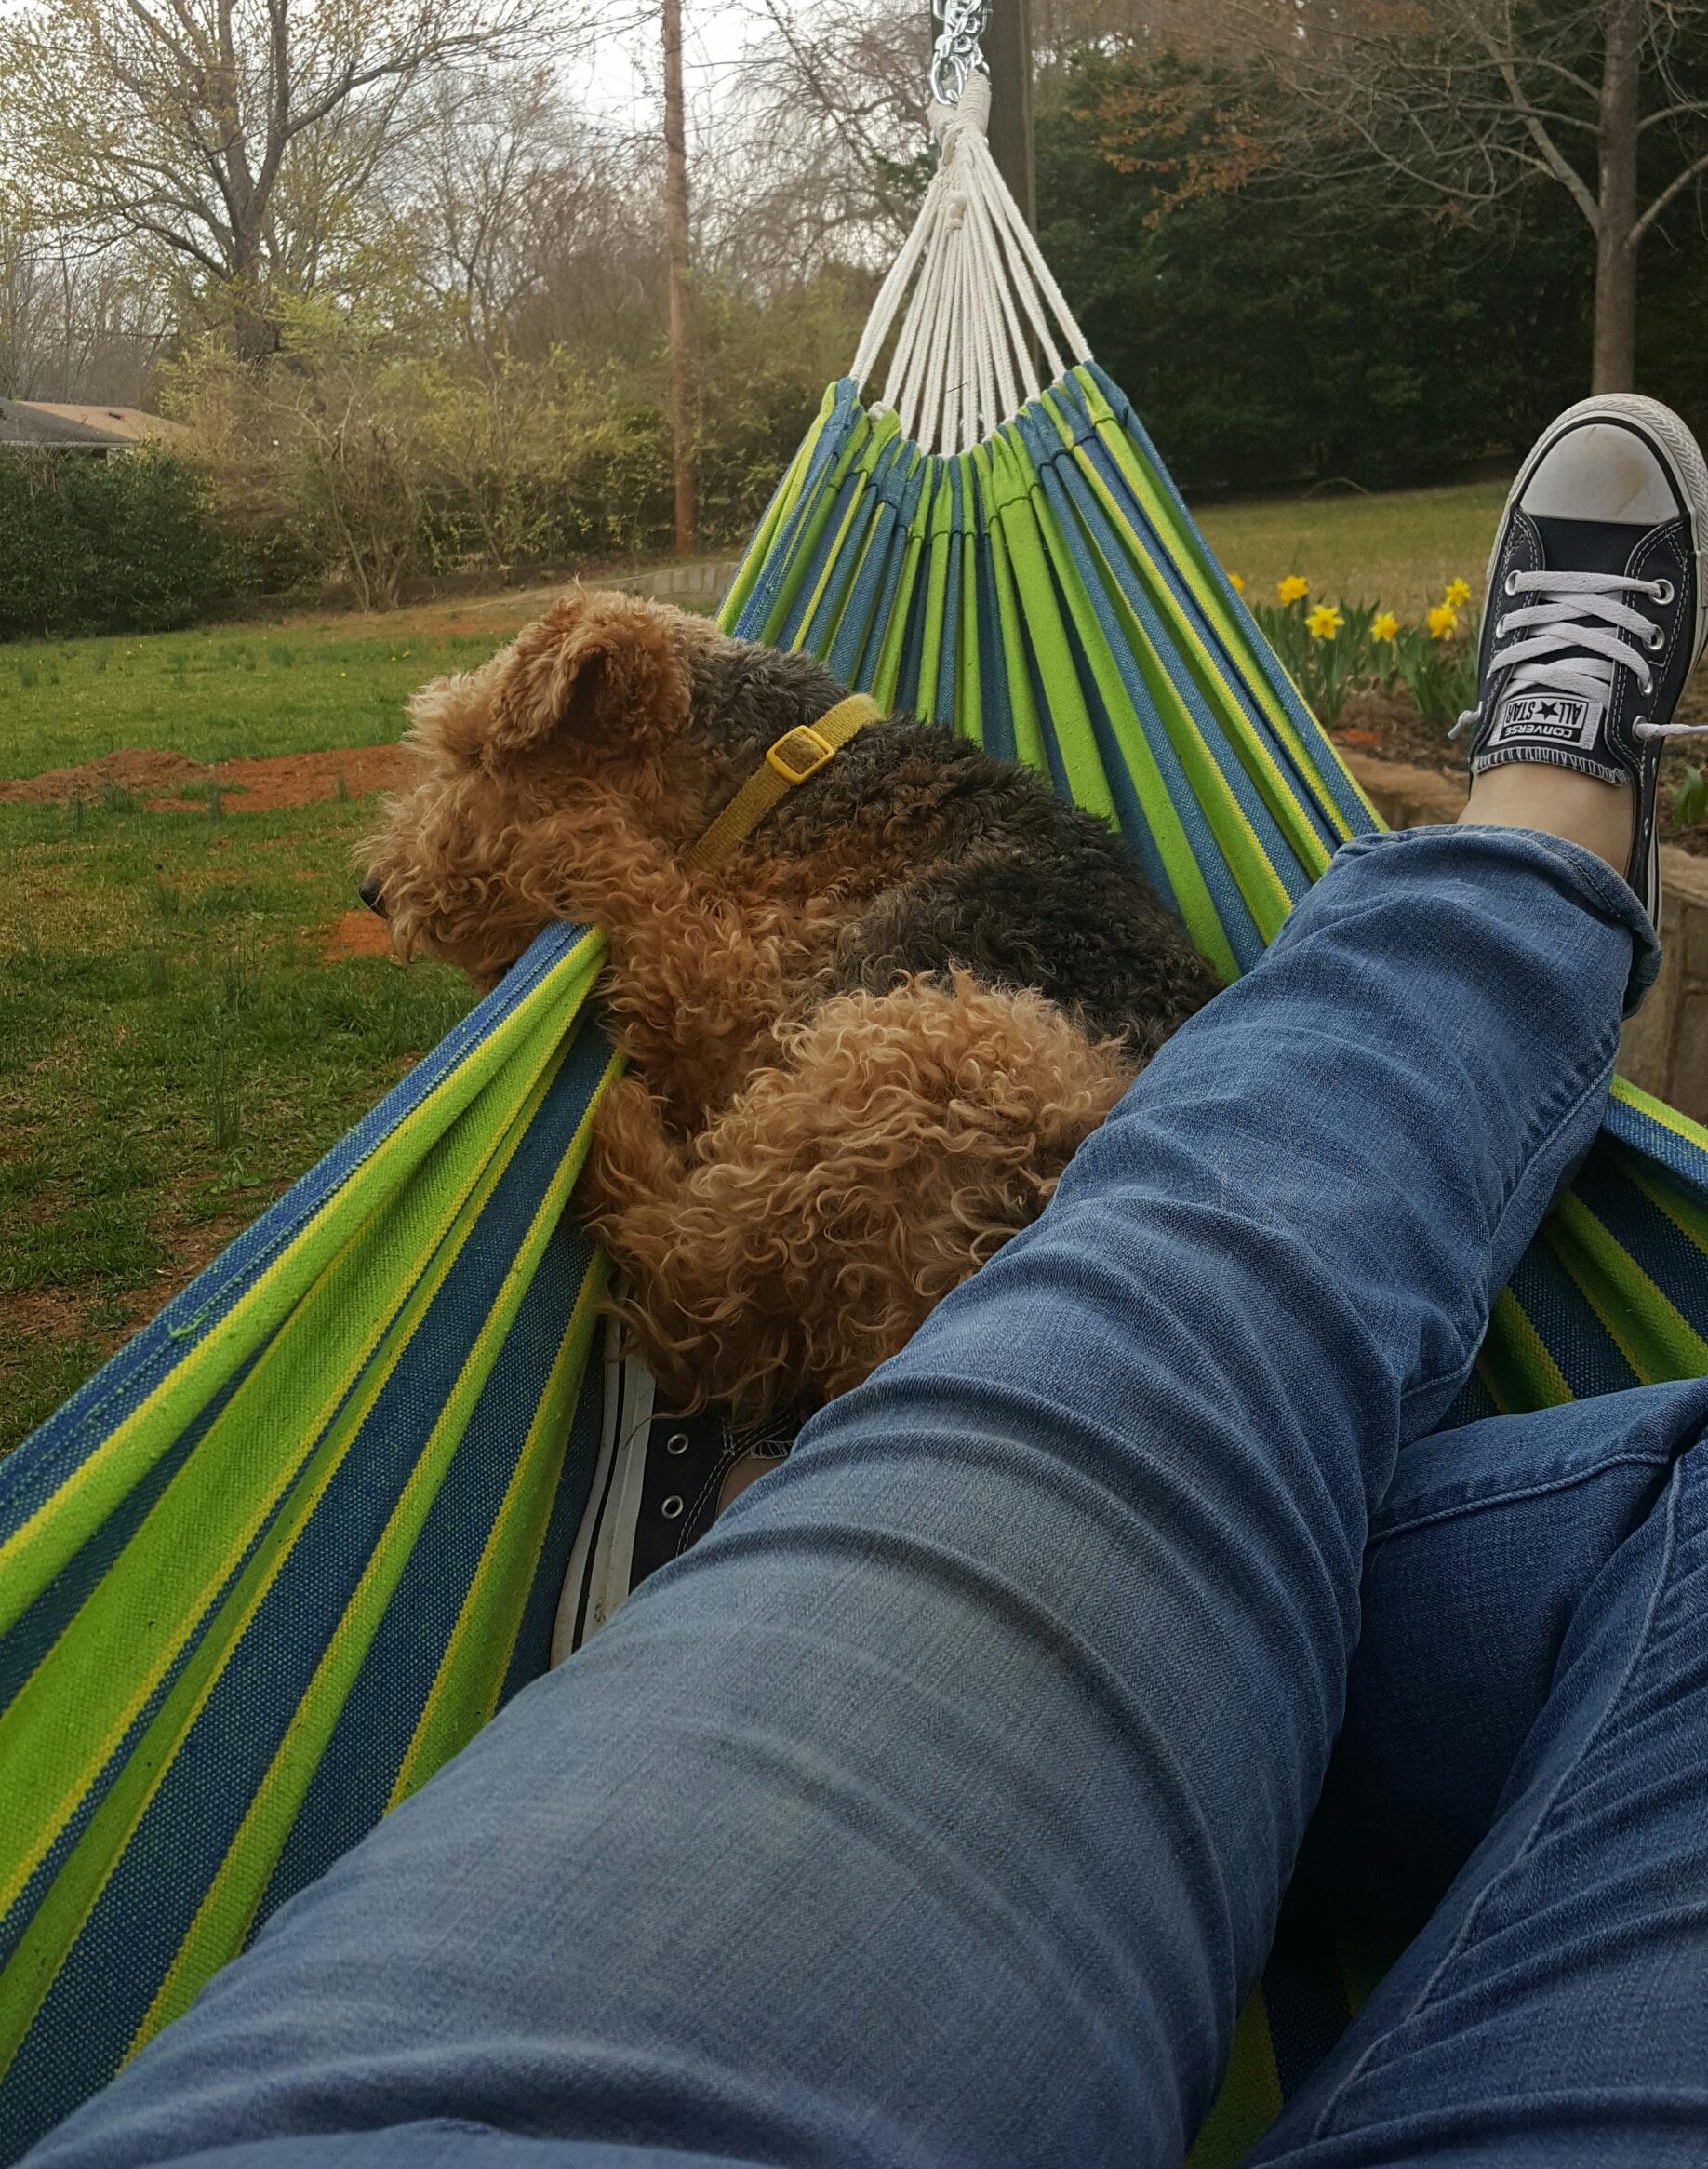 Free stock photo of Dog Day, lazy day